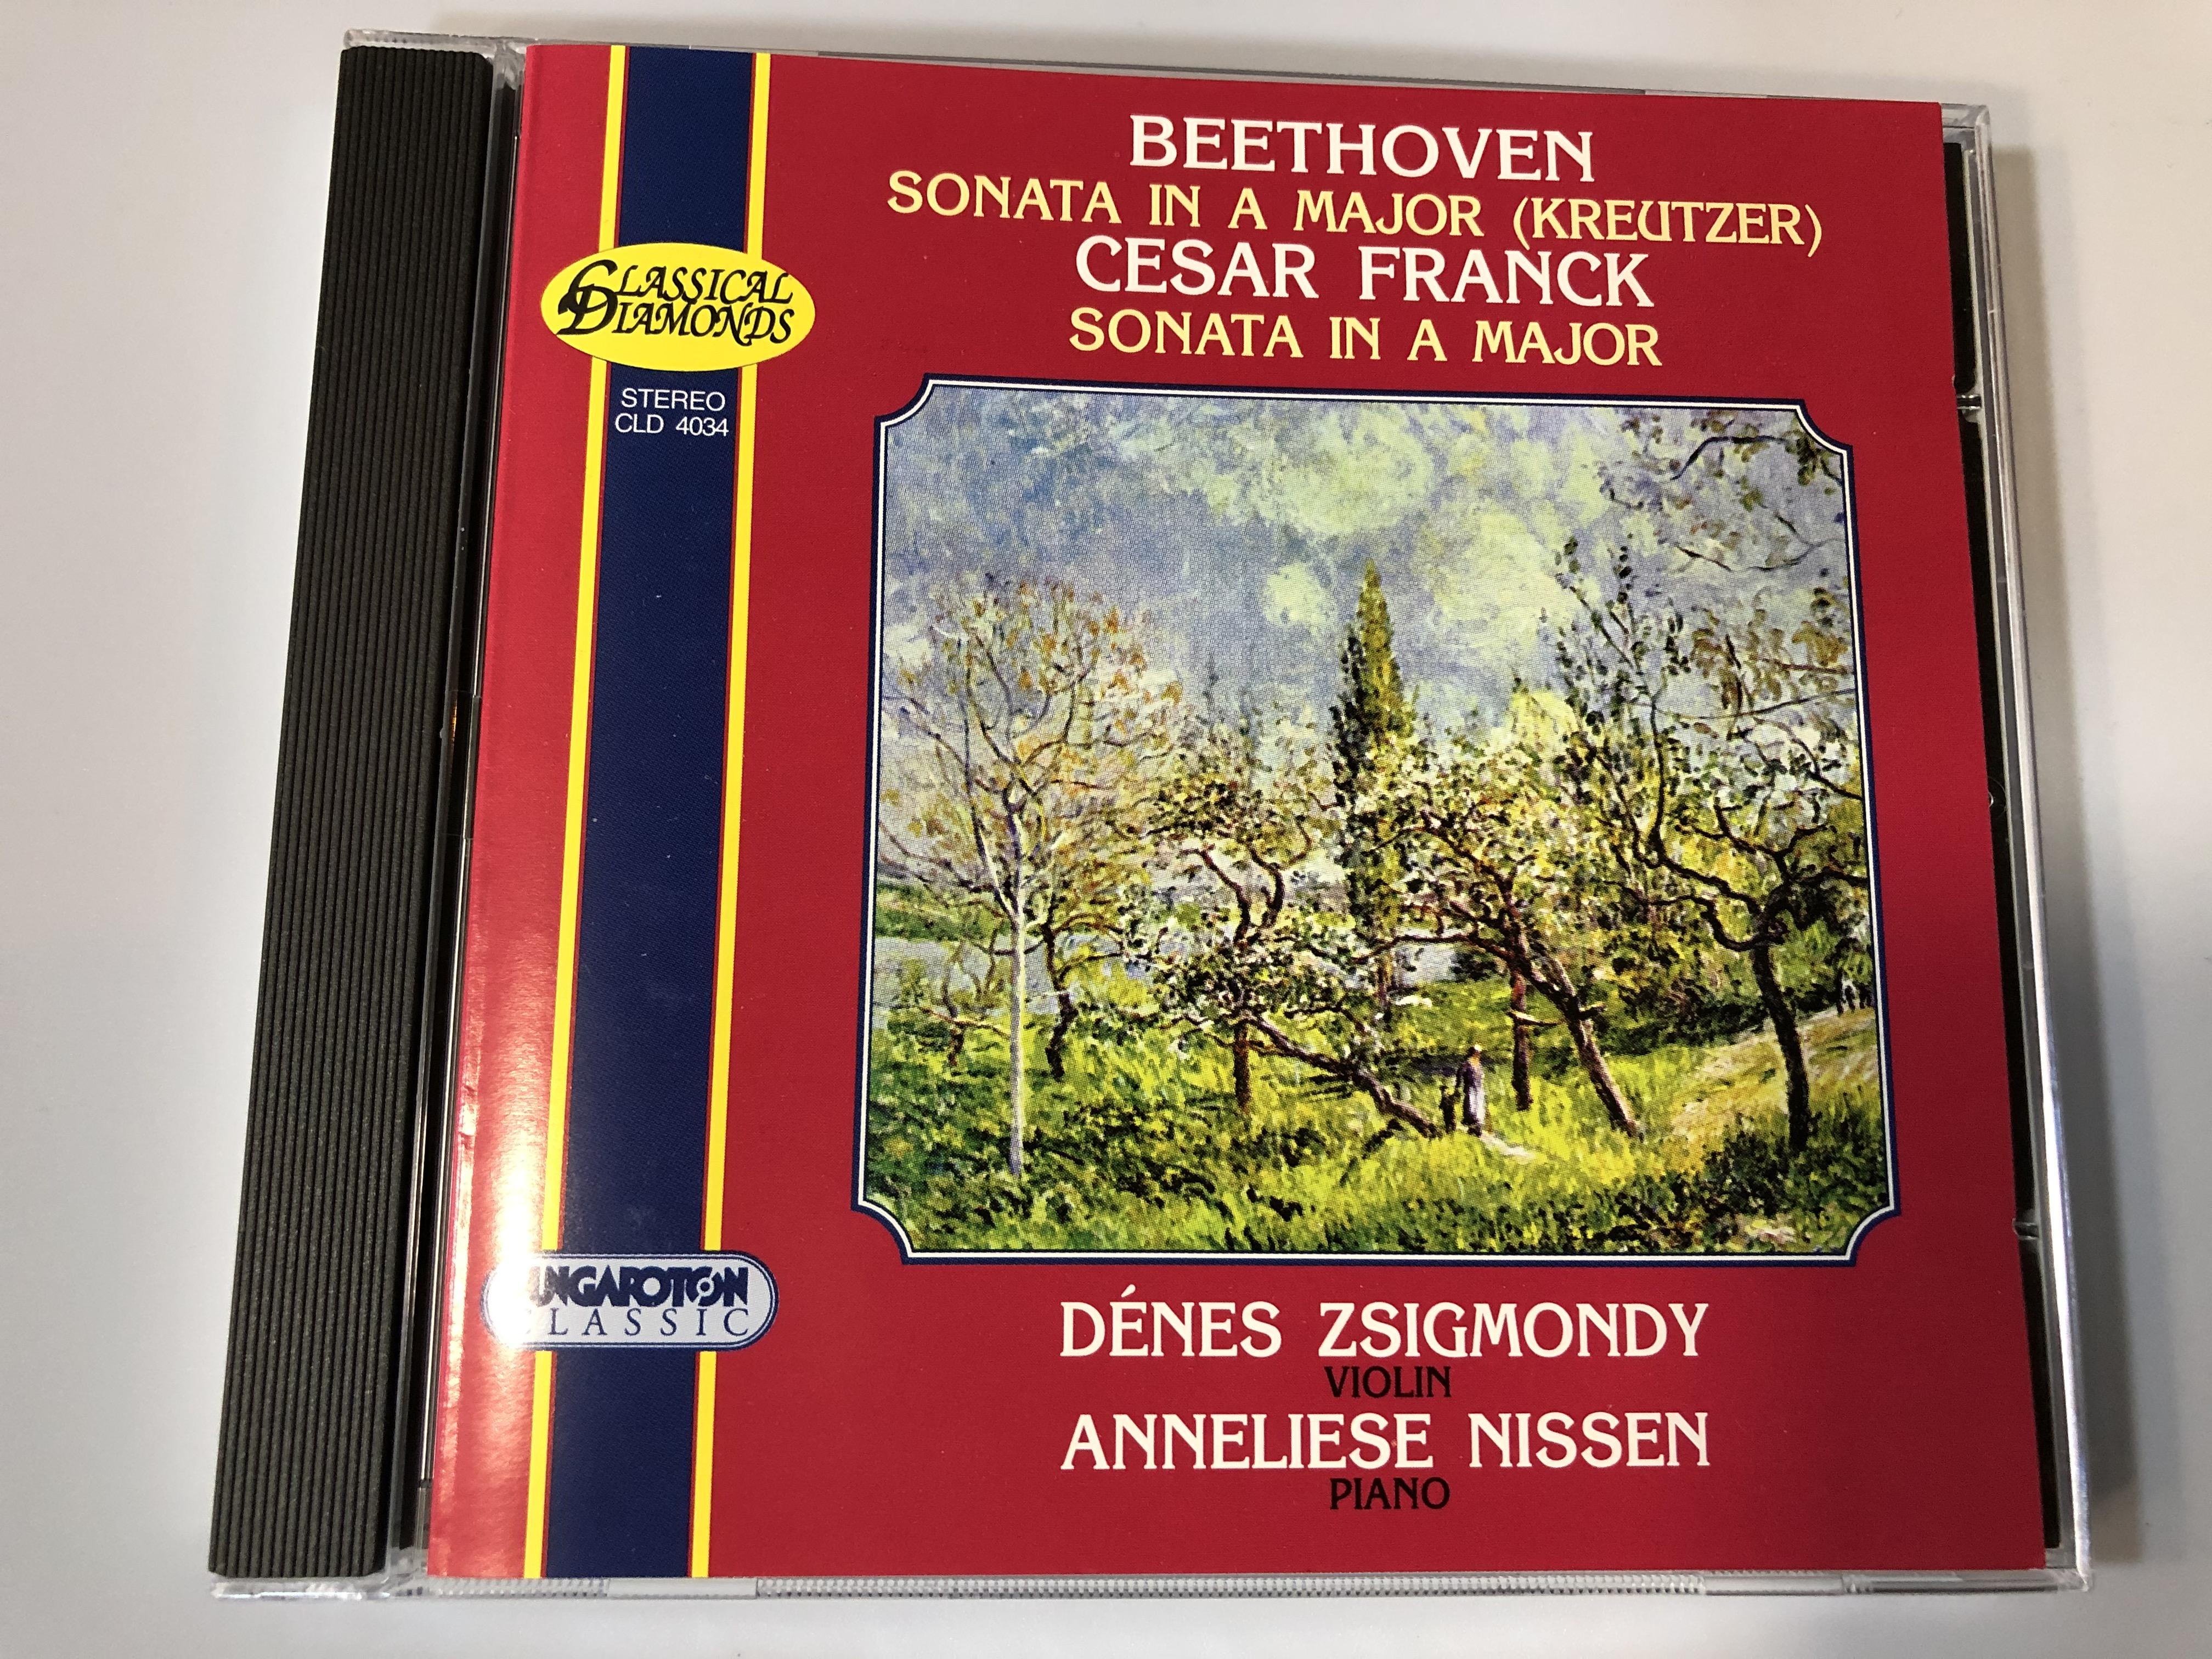 beethoven-sonata-in-a-major-kreutzer-cesar-franck-sonata-in-a-major-denes-zsigmondy-violin-anneliese-nissen-piano-classical-diamonds-hungaroton-classic-audio-cd-1997-stereo-cld-403-1-.jpg